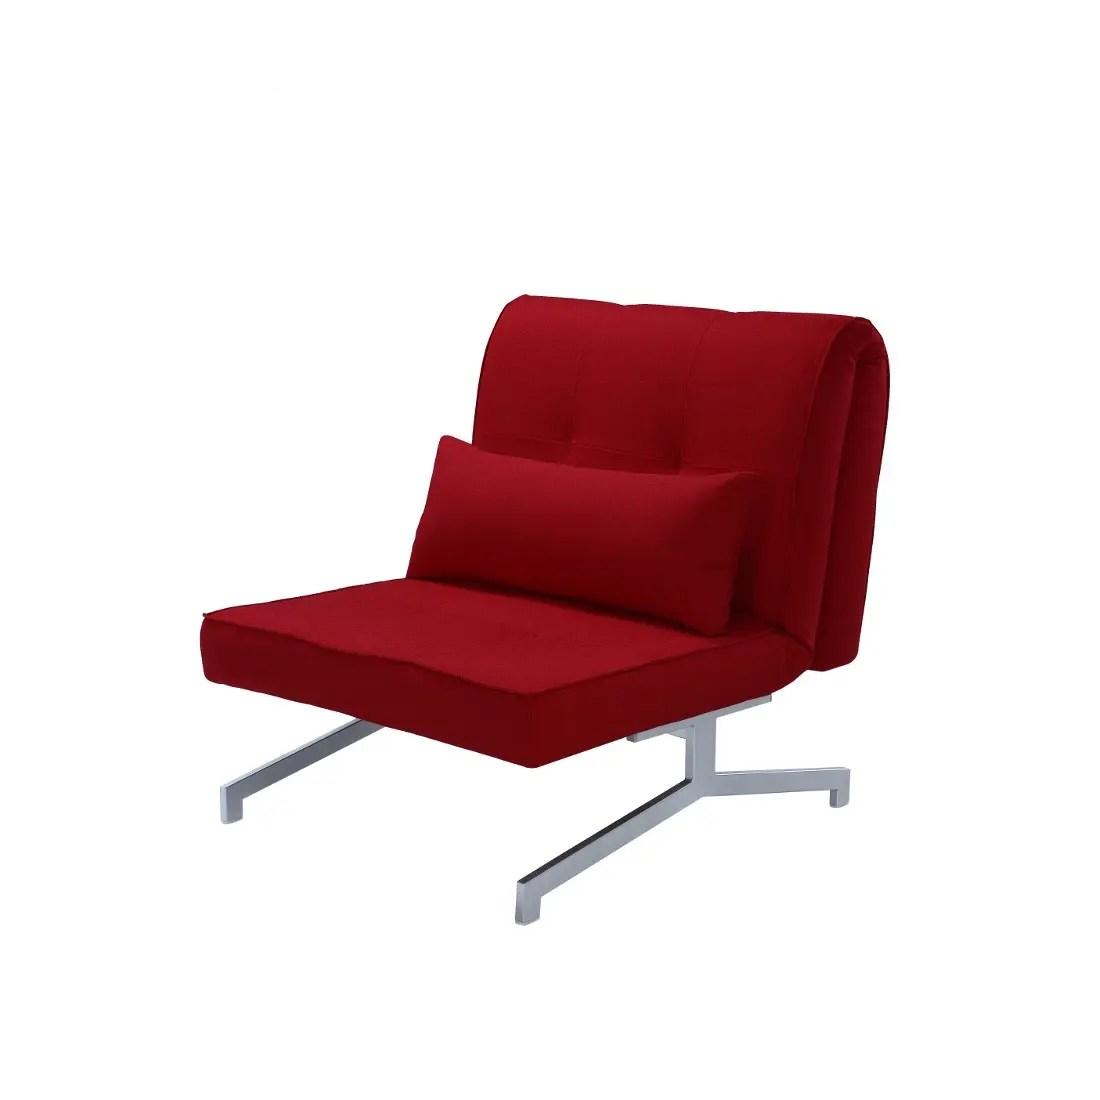 chair to bed convertible chiavari rental tampa cool  cardini uno digsdigs